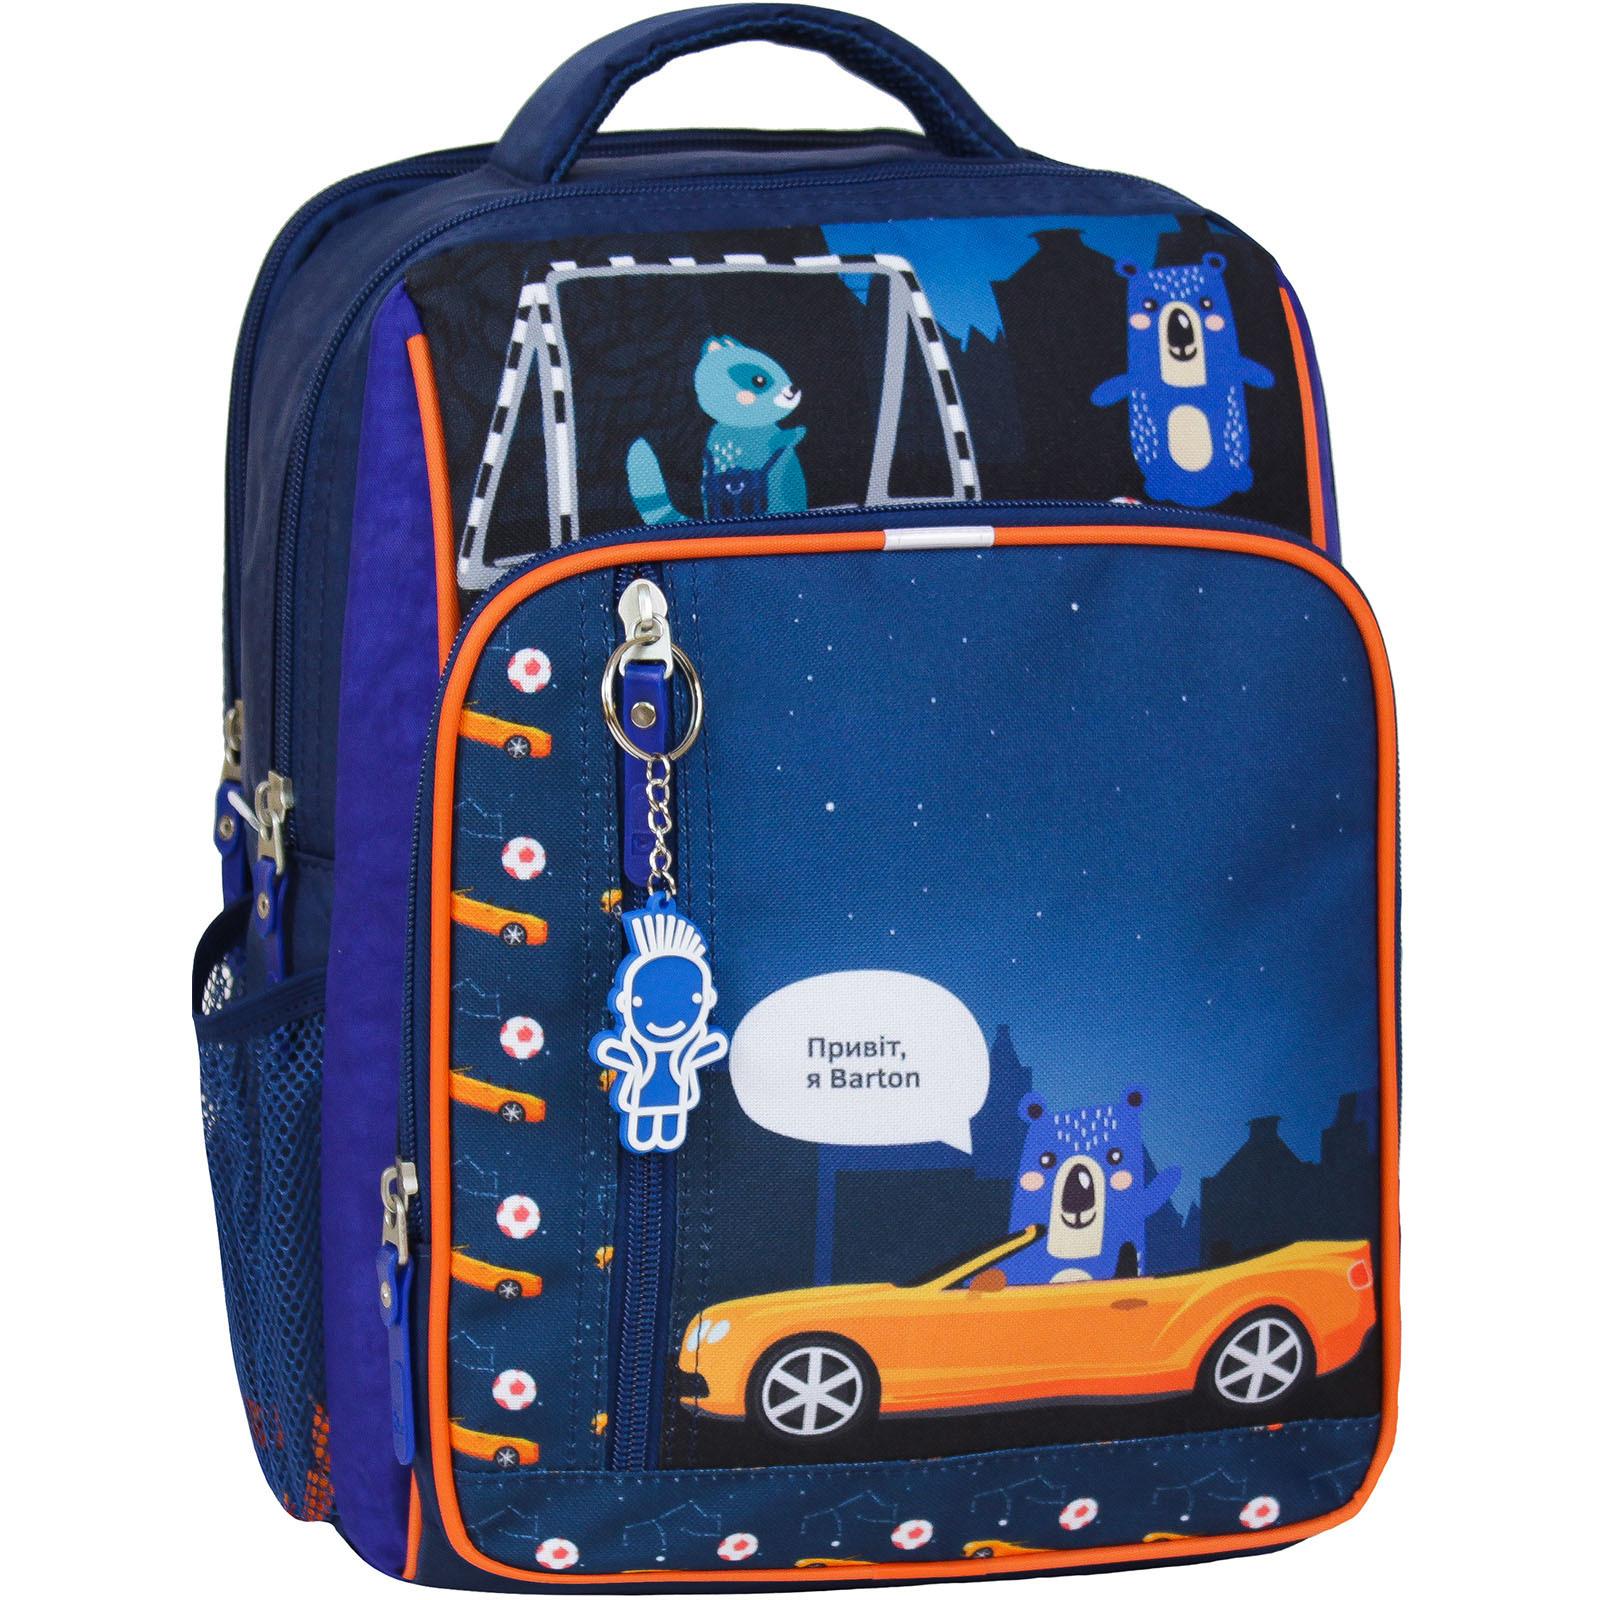 Школьные рюкзаки Рюкзак школьный Bagland Школьник 8 л. 225 синий 432 (00112702) IMG_4848-суб432.jpg